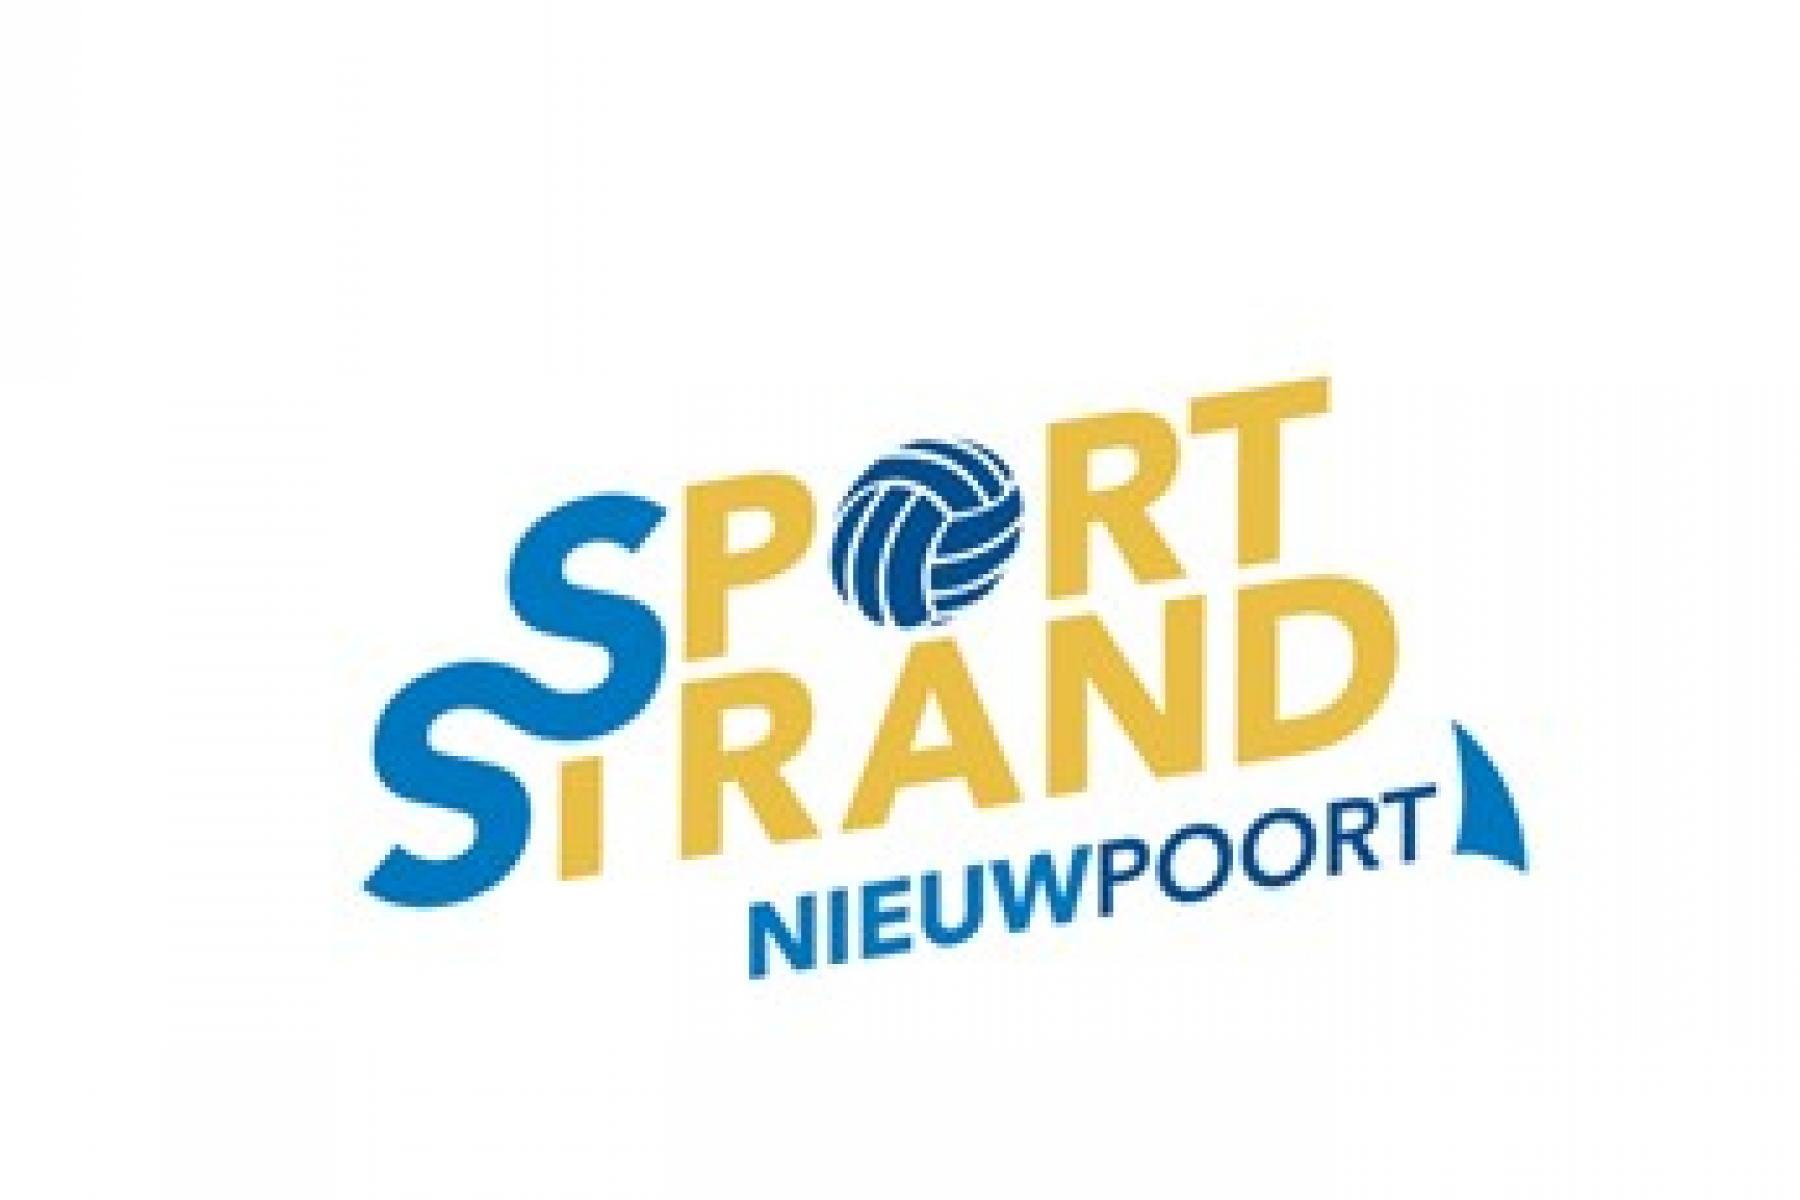 Visit-Nieuwpoort - Sportstrand The beach to play